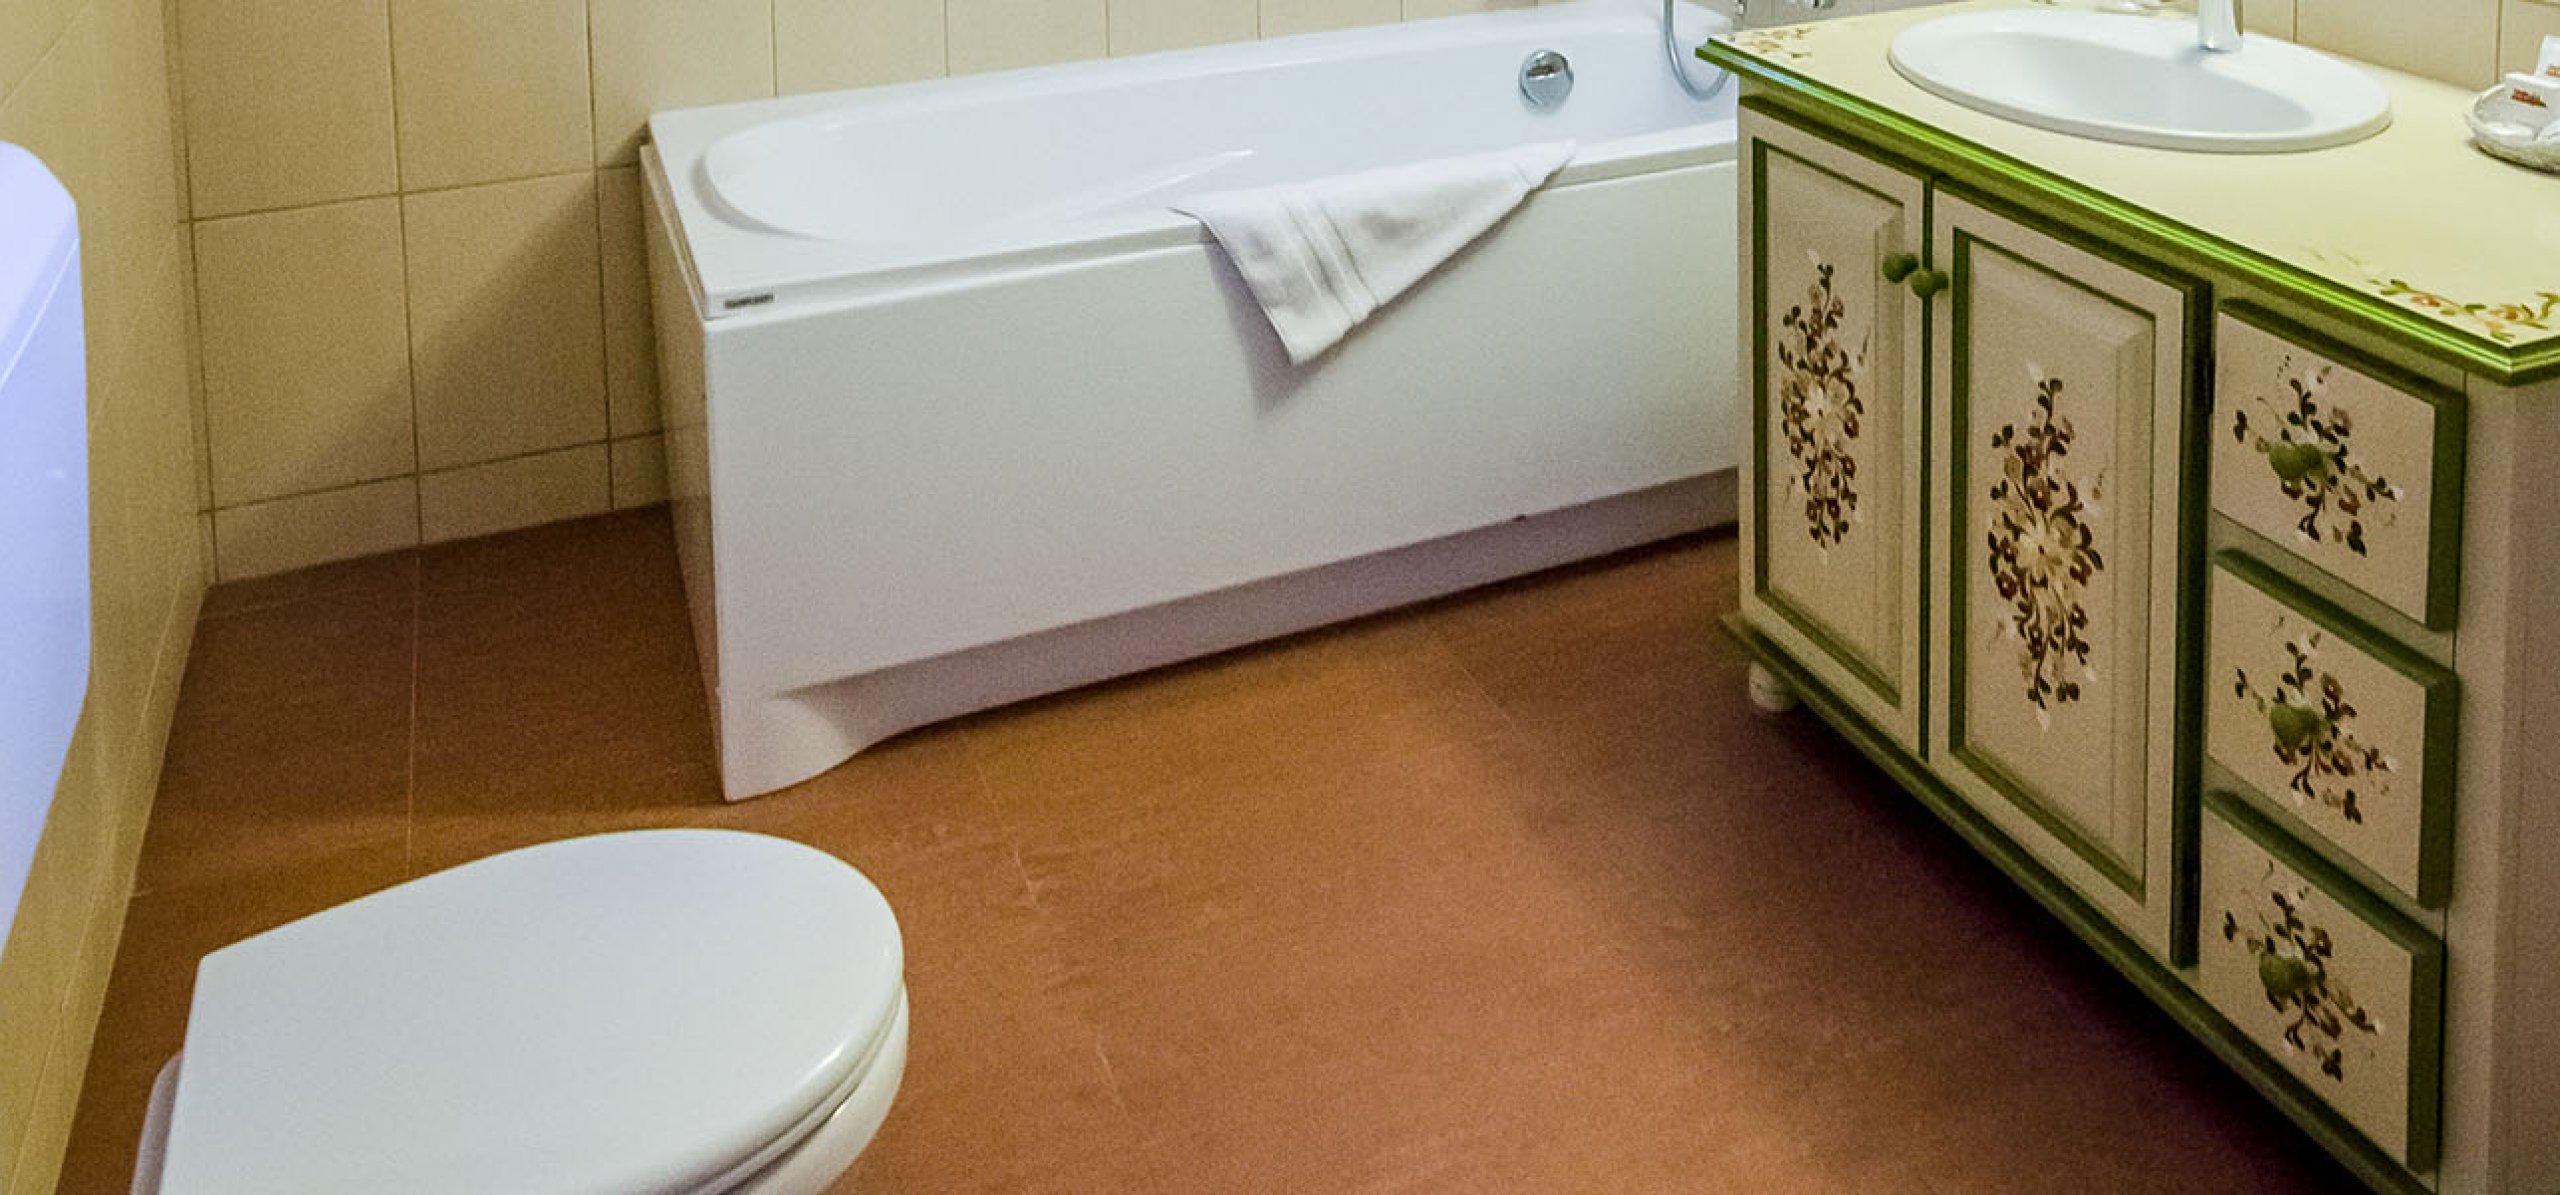 grup-sanitar-elegant-vila-fagul-cheile-gradistei-fundata-1